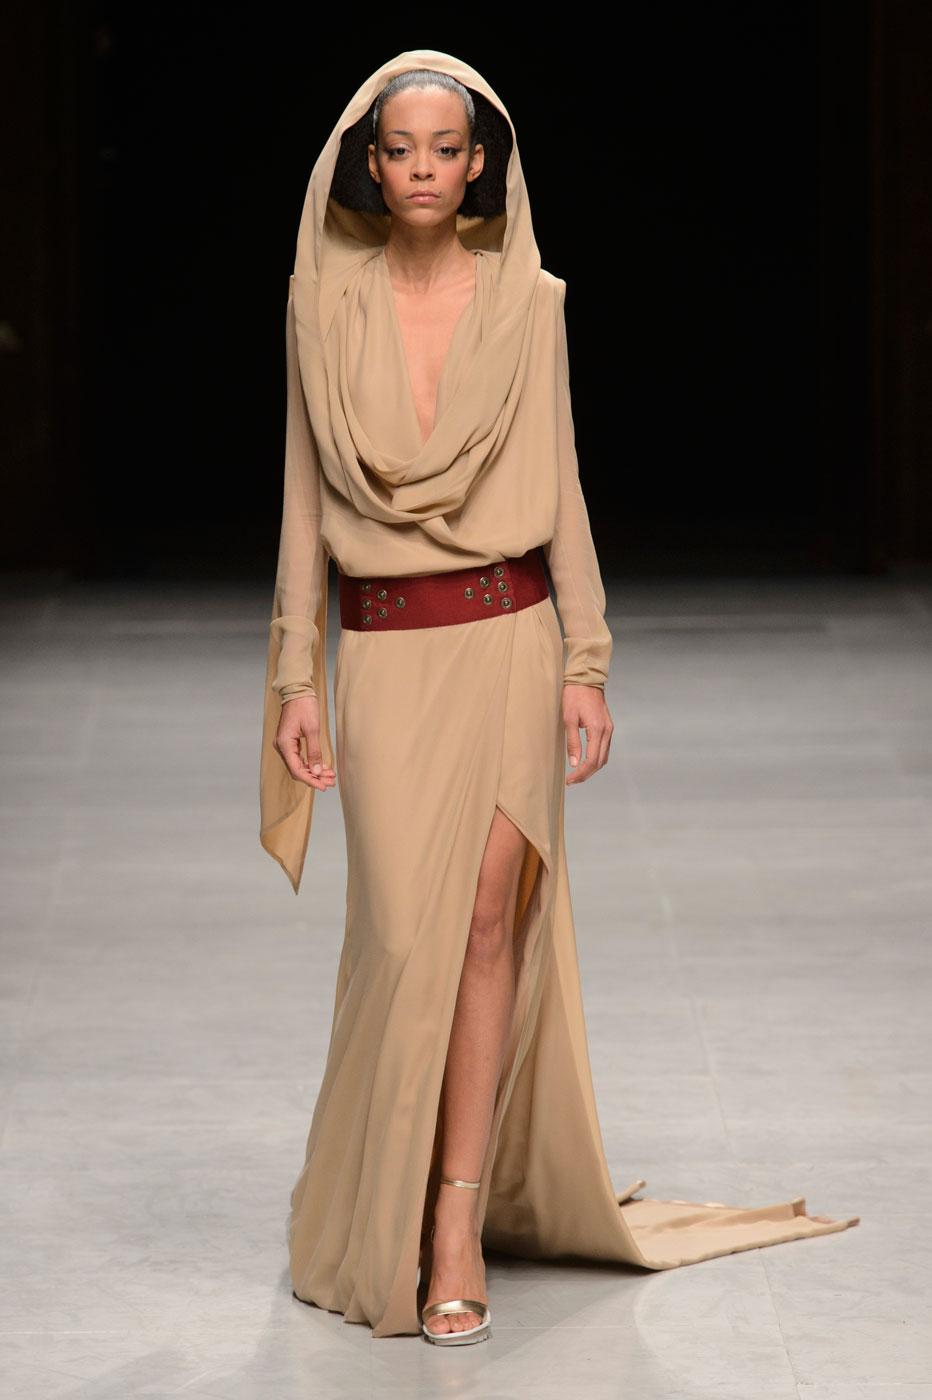 Julien-Fournie-Prive-fashion-runway-show-haute-couture-paris-spring-2015-the-impression-26